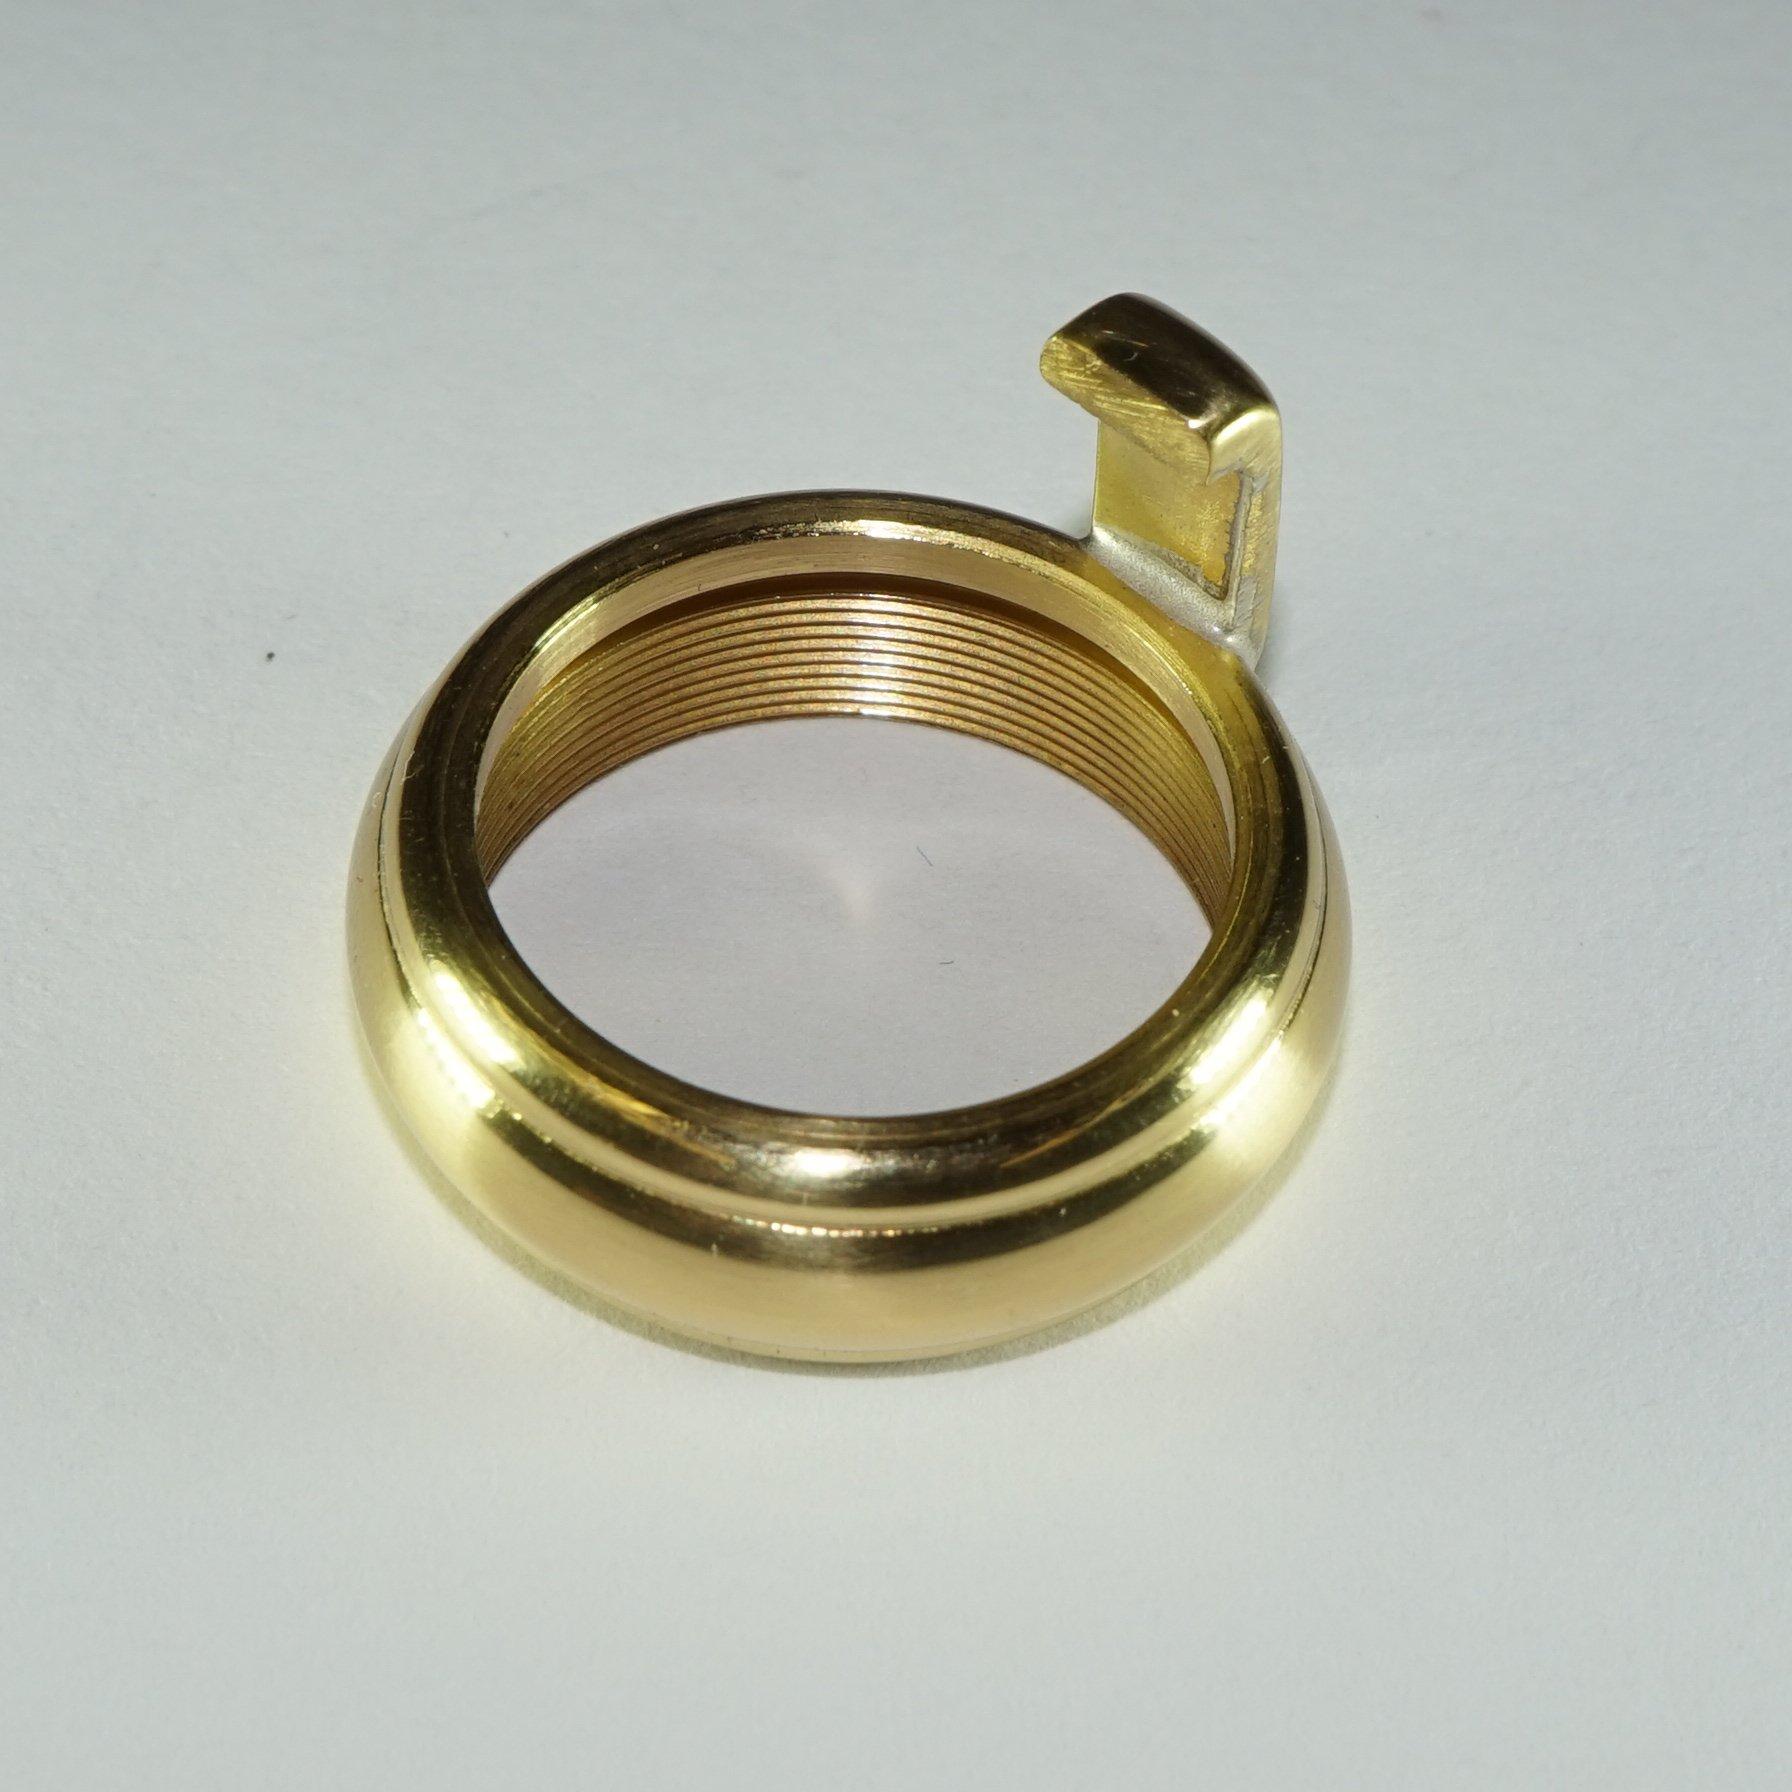 Yamaha Trombone Slide Lock Ring